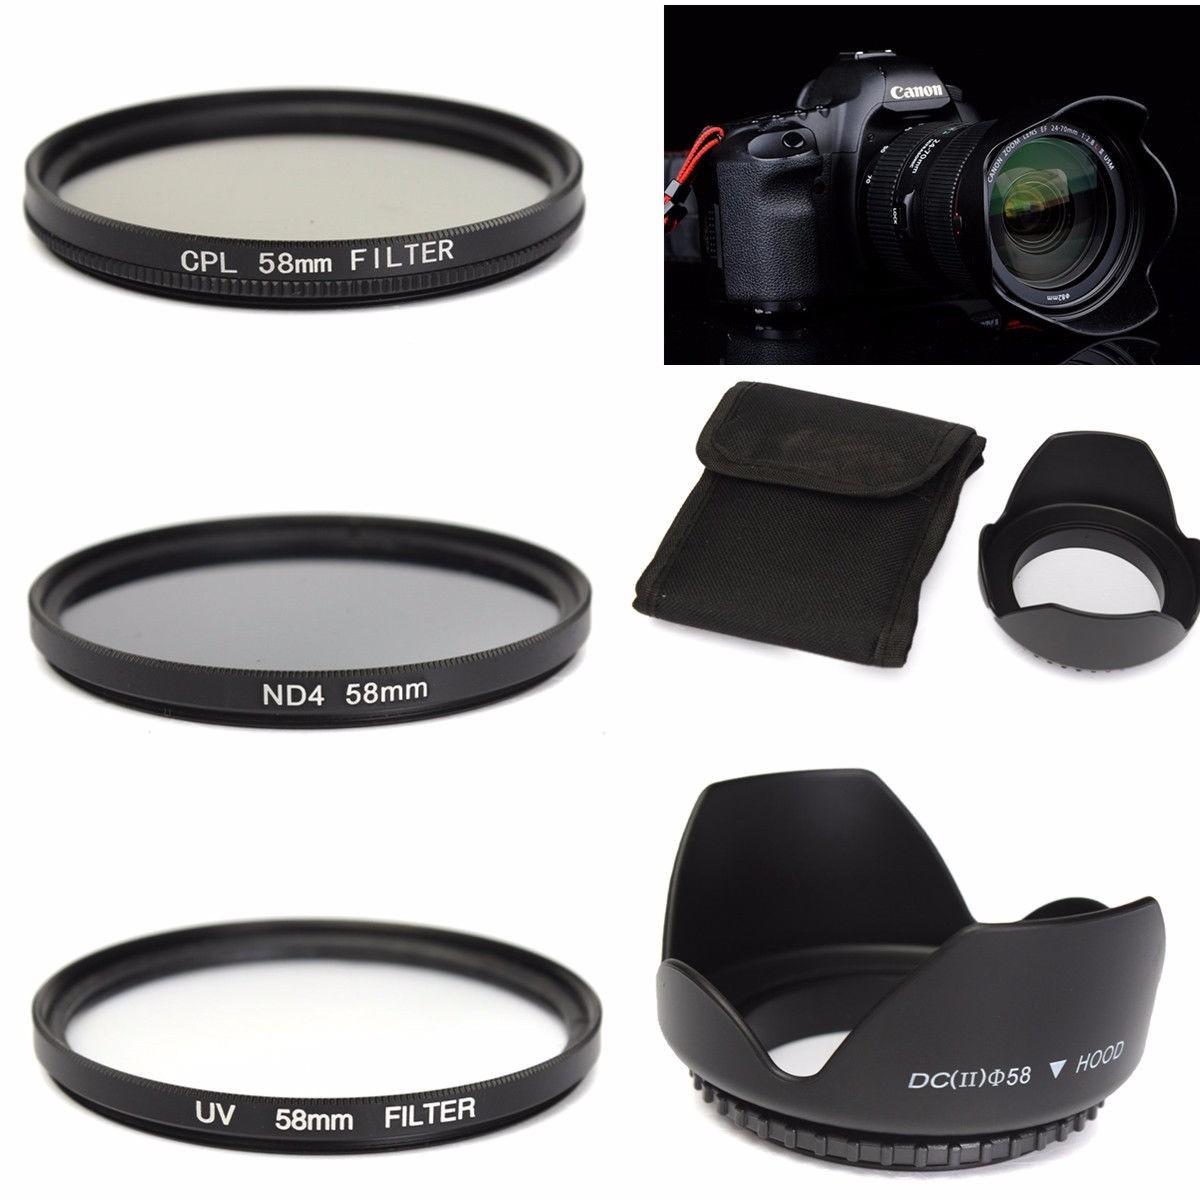 Buyincoins Ew 54 Ew54 Kap Lensa Kamera Untuk Canon Eosm Ef M 18 55 Lens Hood Et 54b Tele 200mm F45 63 Is Stm Eos 250mm Murah Source For S 55mm